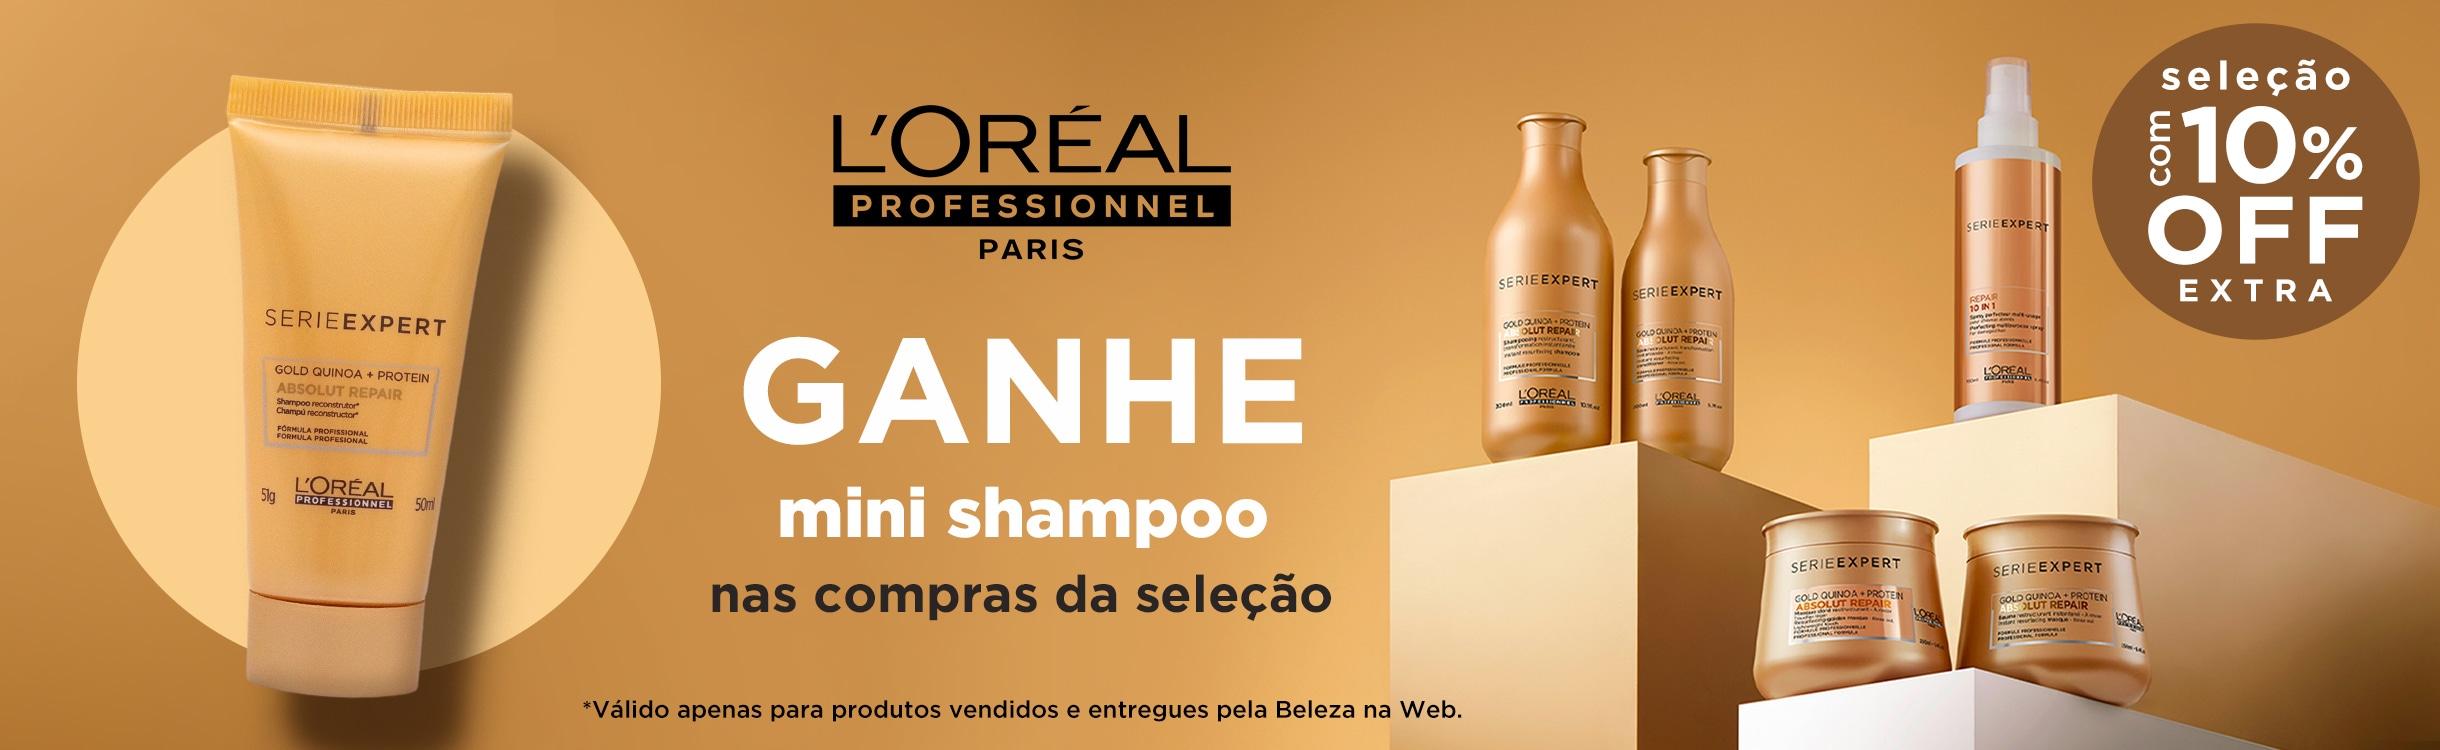 10% OFF Extra em L'oréal Professionnel